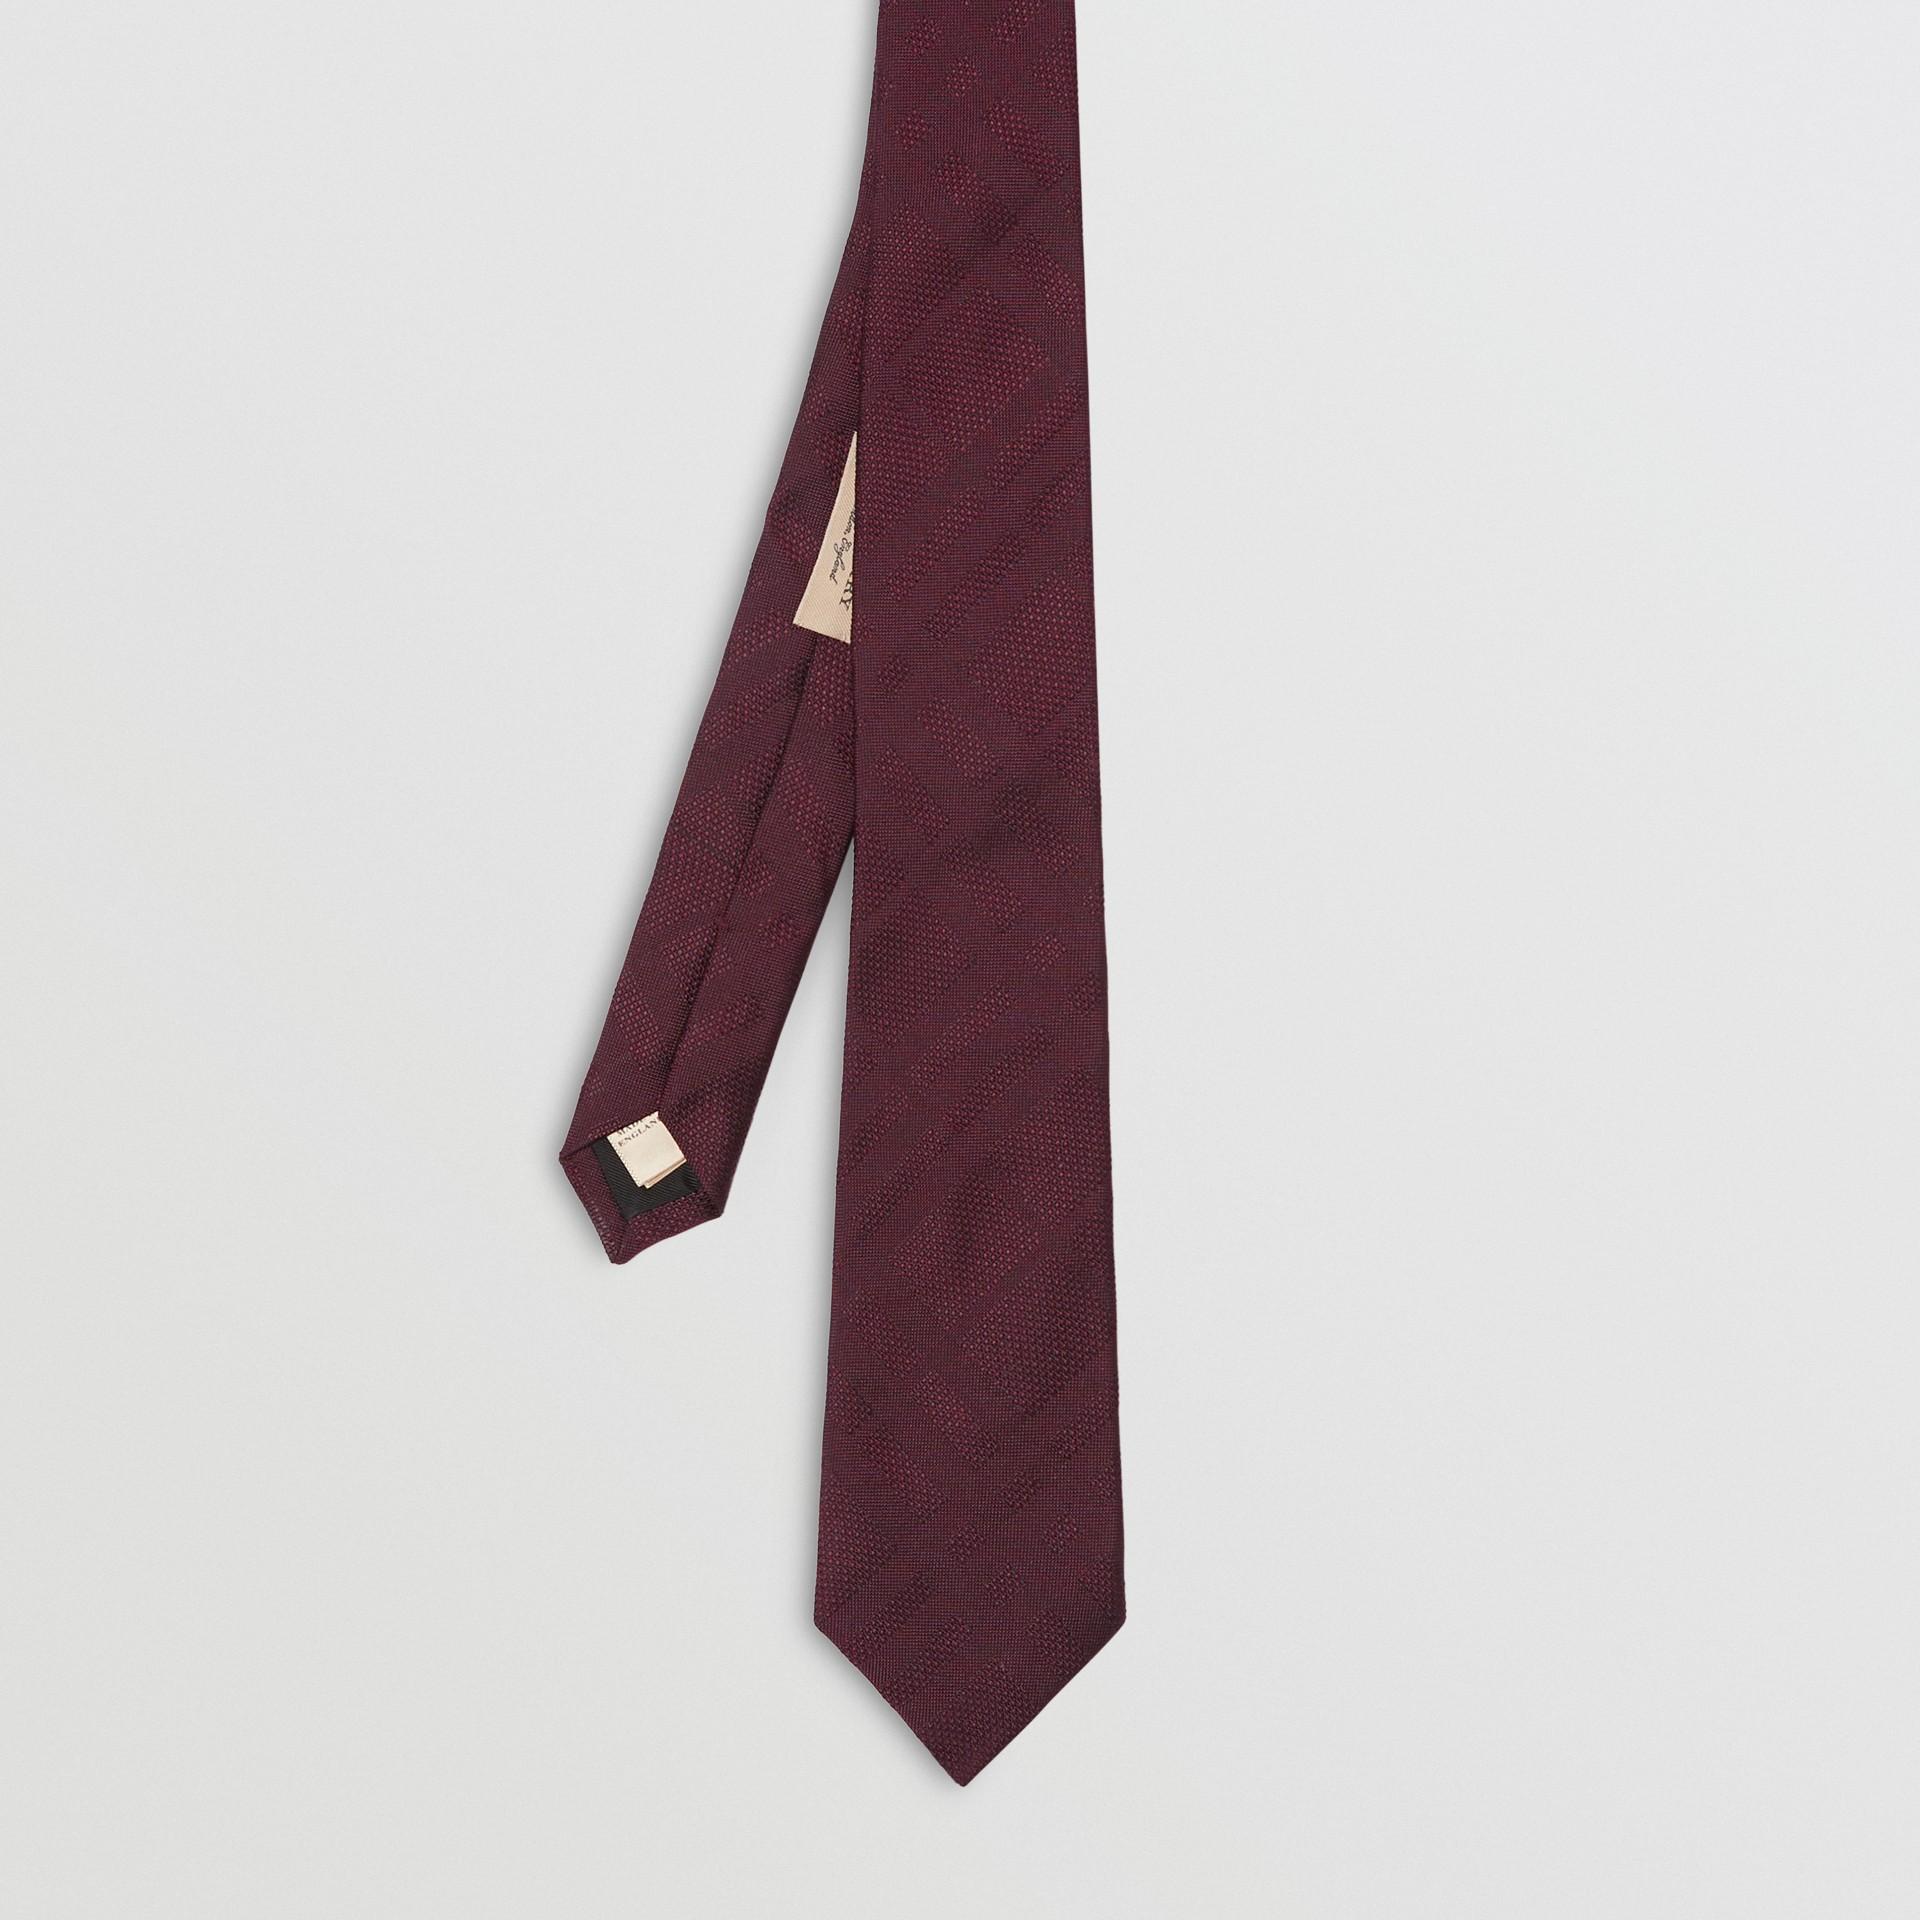 Modern Cut Check Silk Tie in Deep Claret - Men | Burberry - gallery image 3